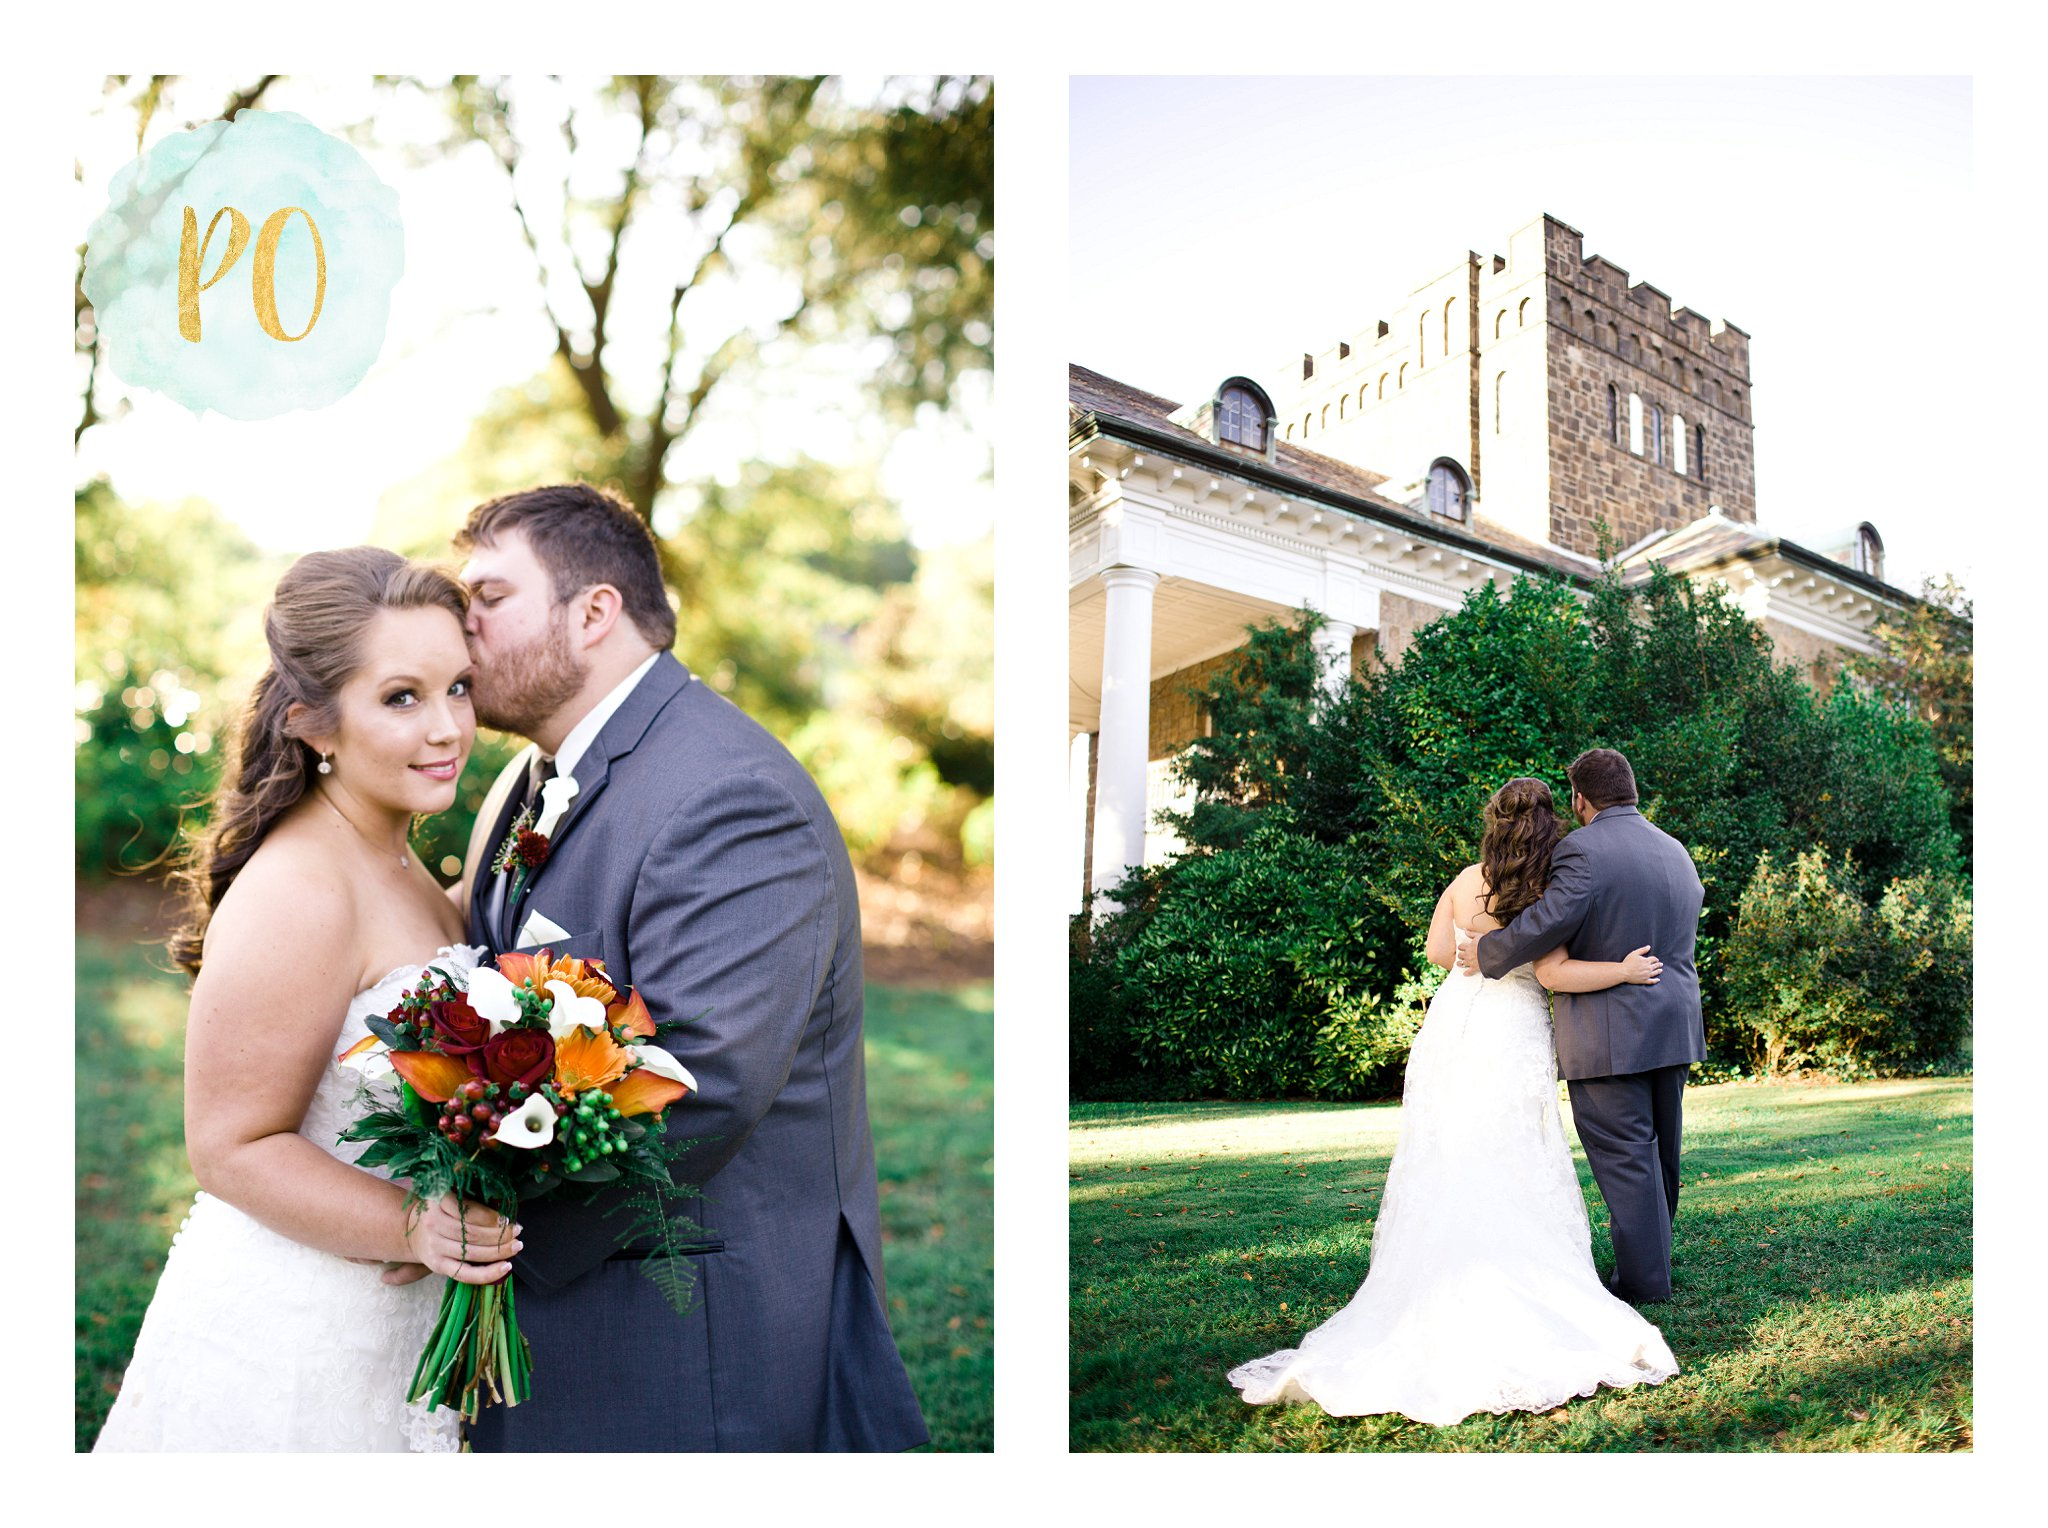 gassaway-mansion-fall-wedding-greenvile-sc-photos_0036.jpg